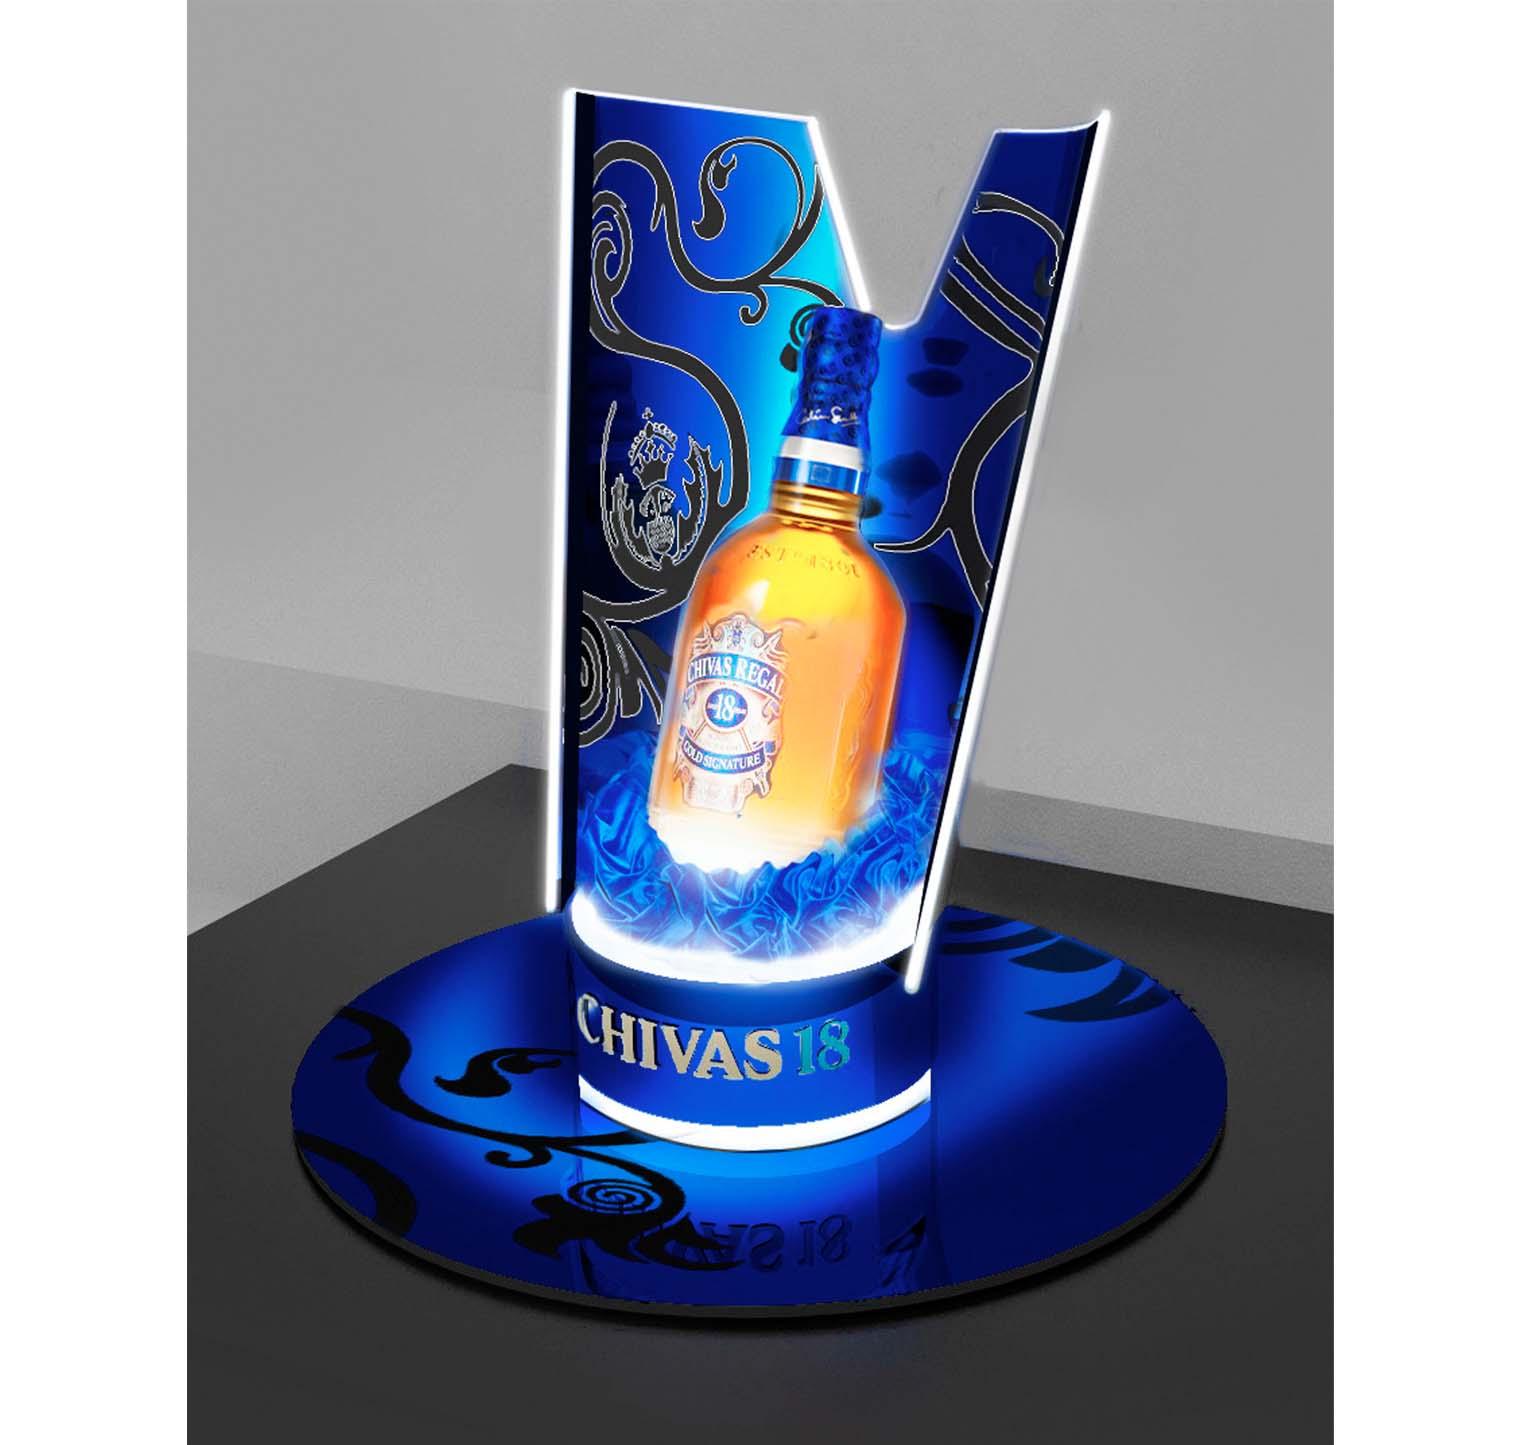 Curved Illuminated - Chivas